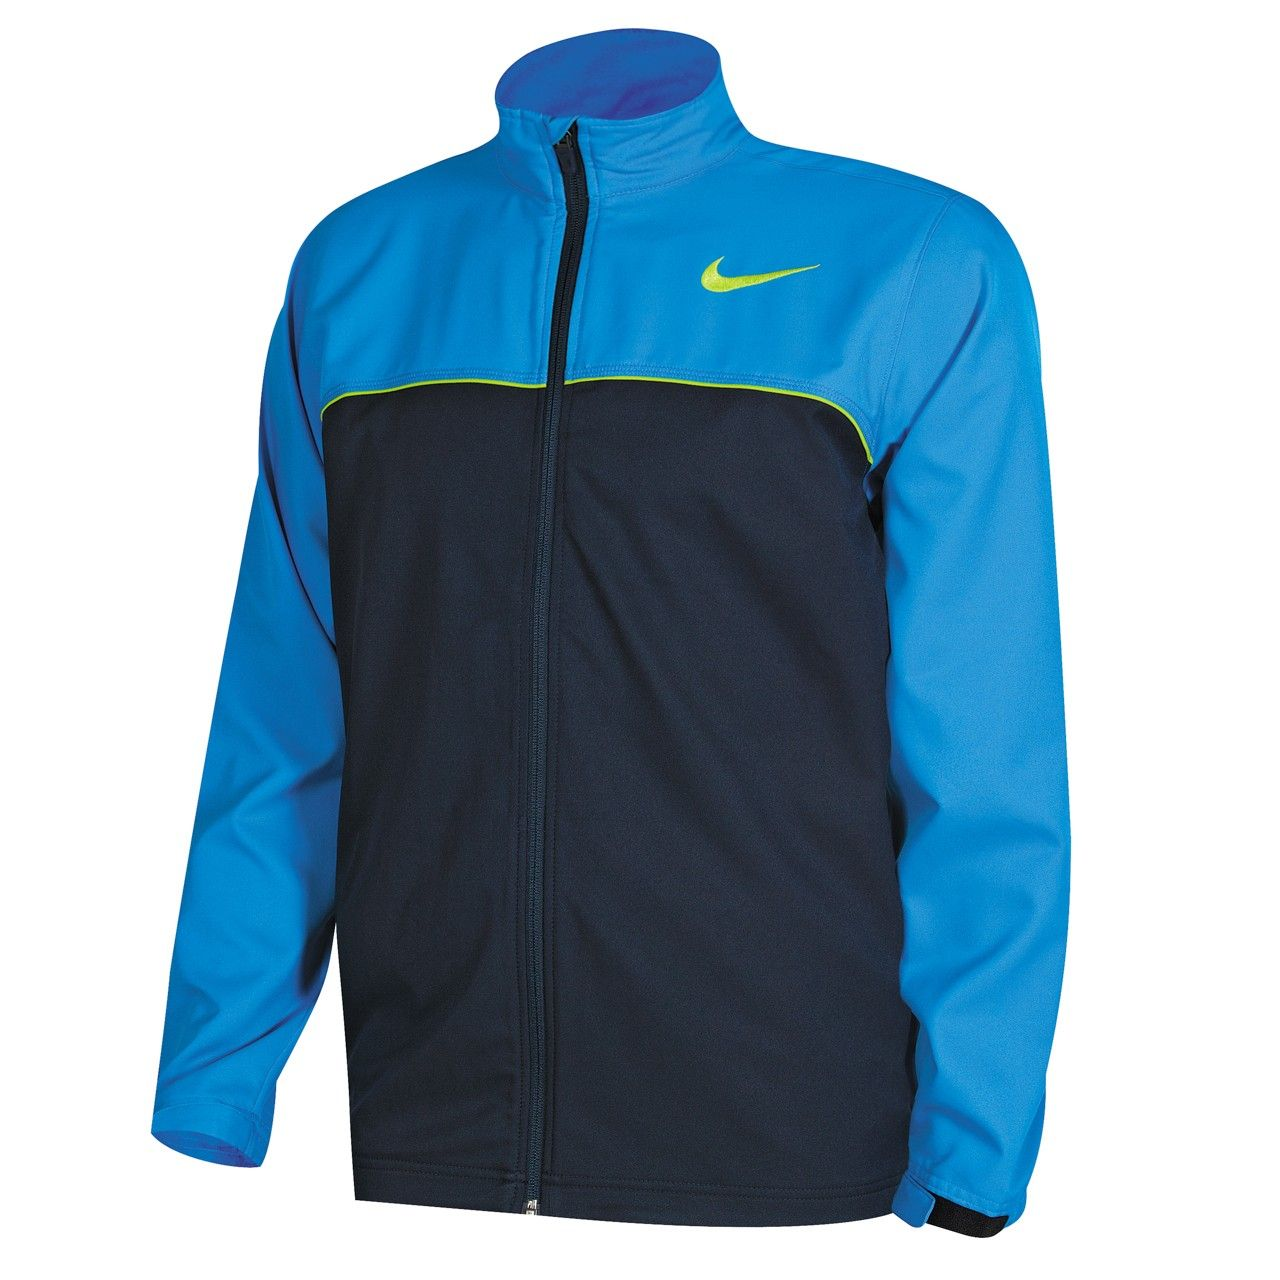 b7b41203fce Chamarra Nike